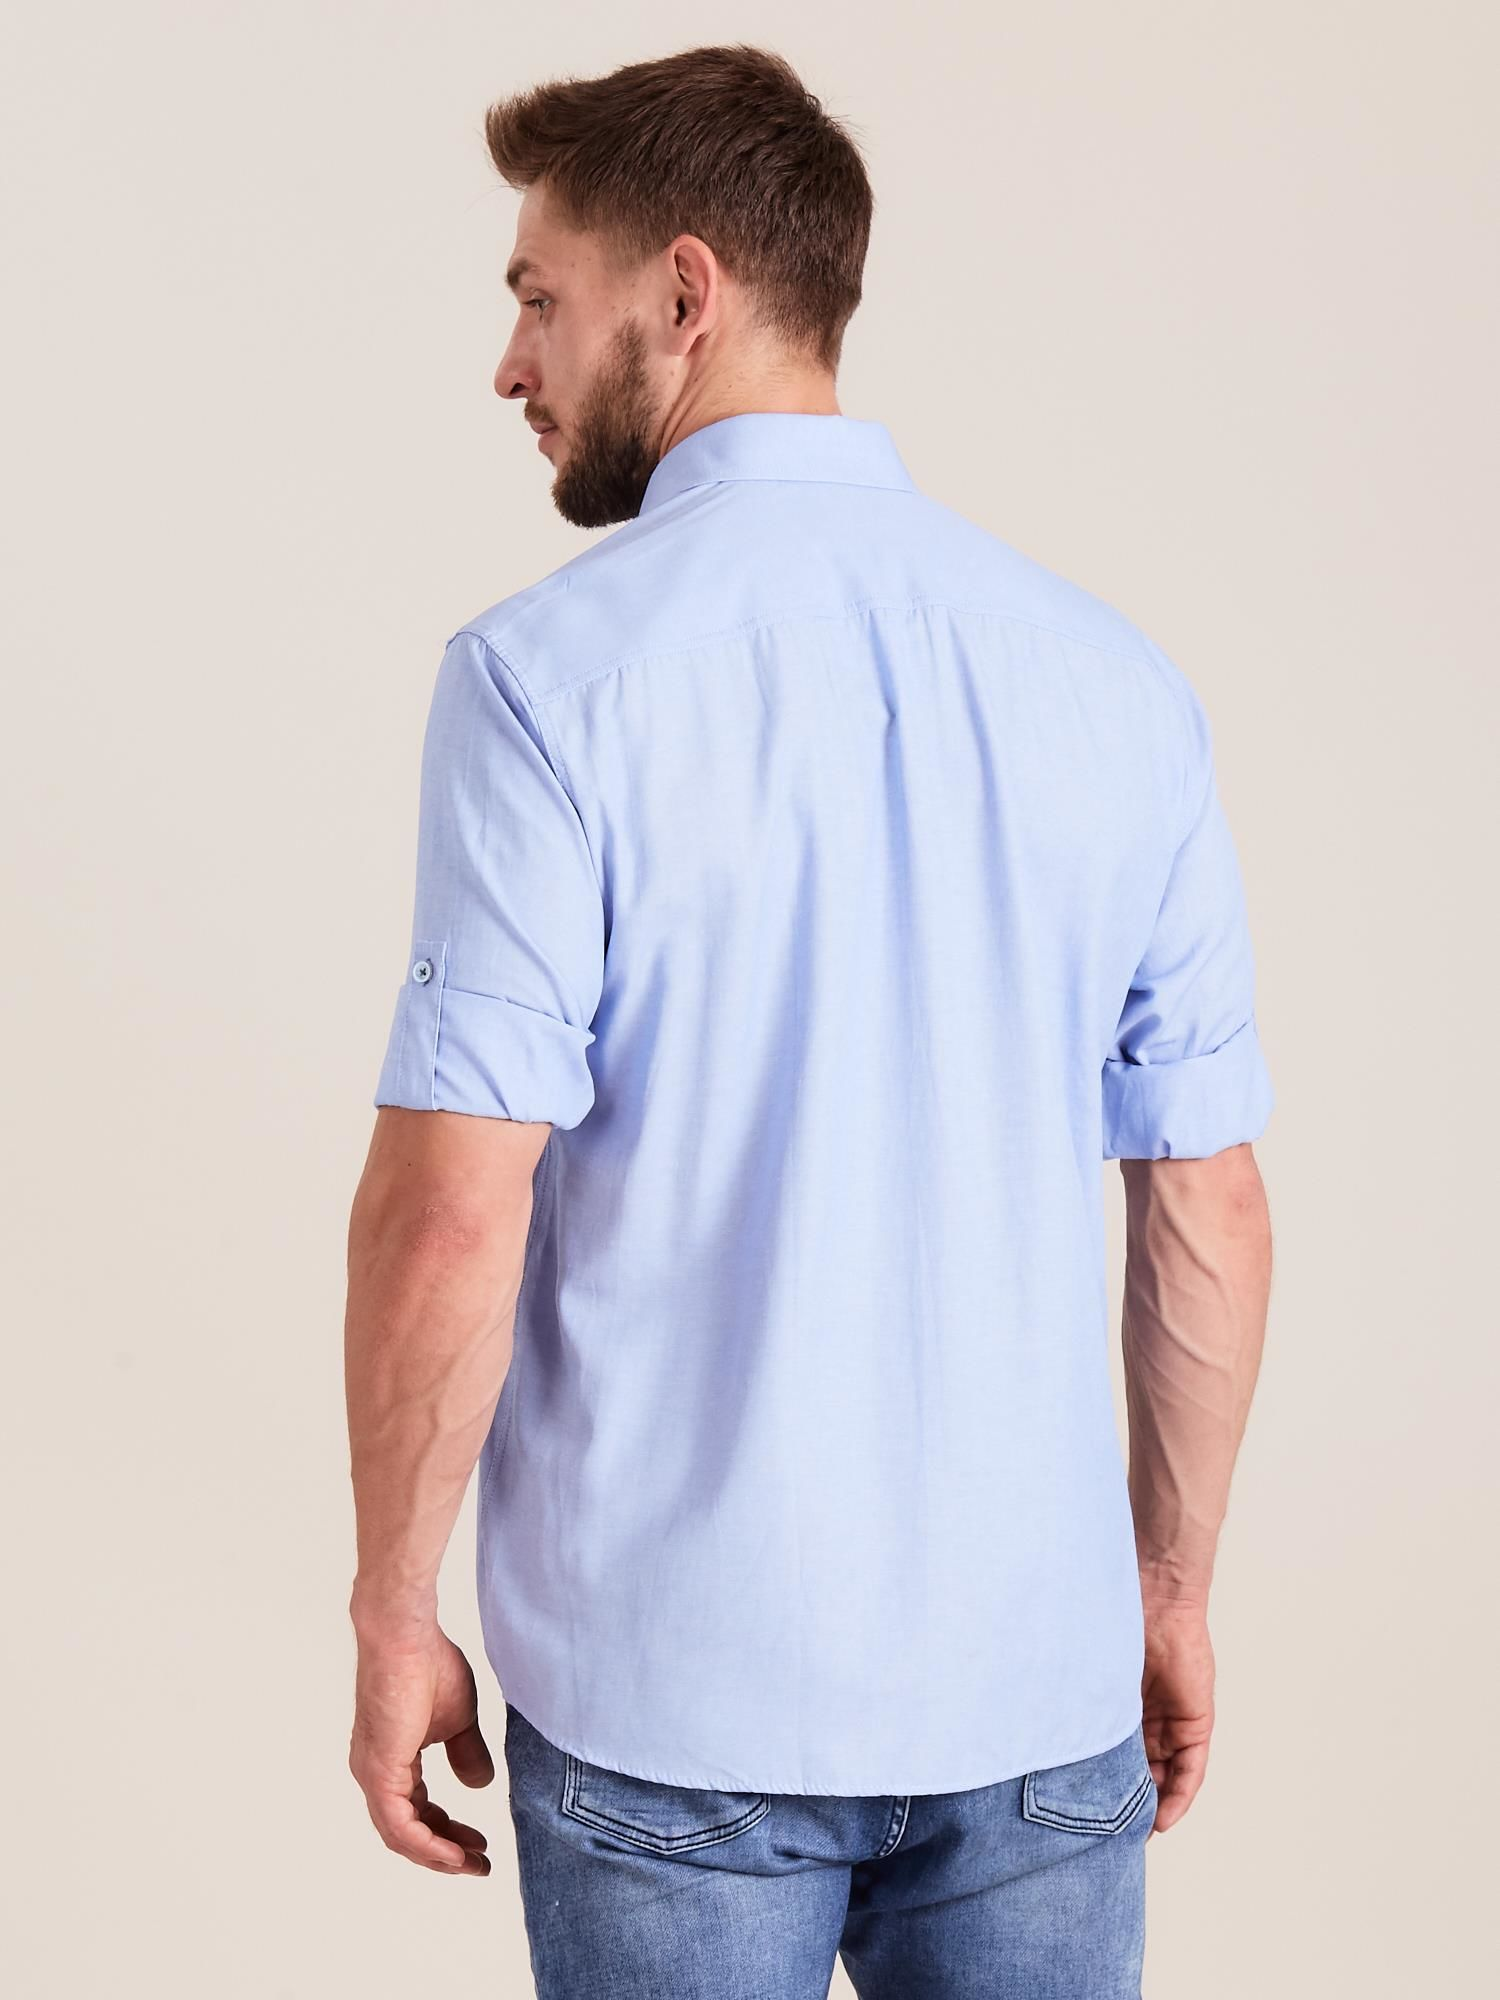 186036e7ed8234 Niebieska koszula męska o regularnym kroju - Mężczyźni koszula męska -  sklep eButik.pl